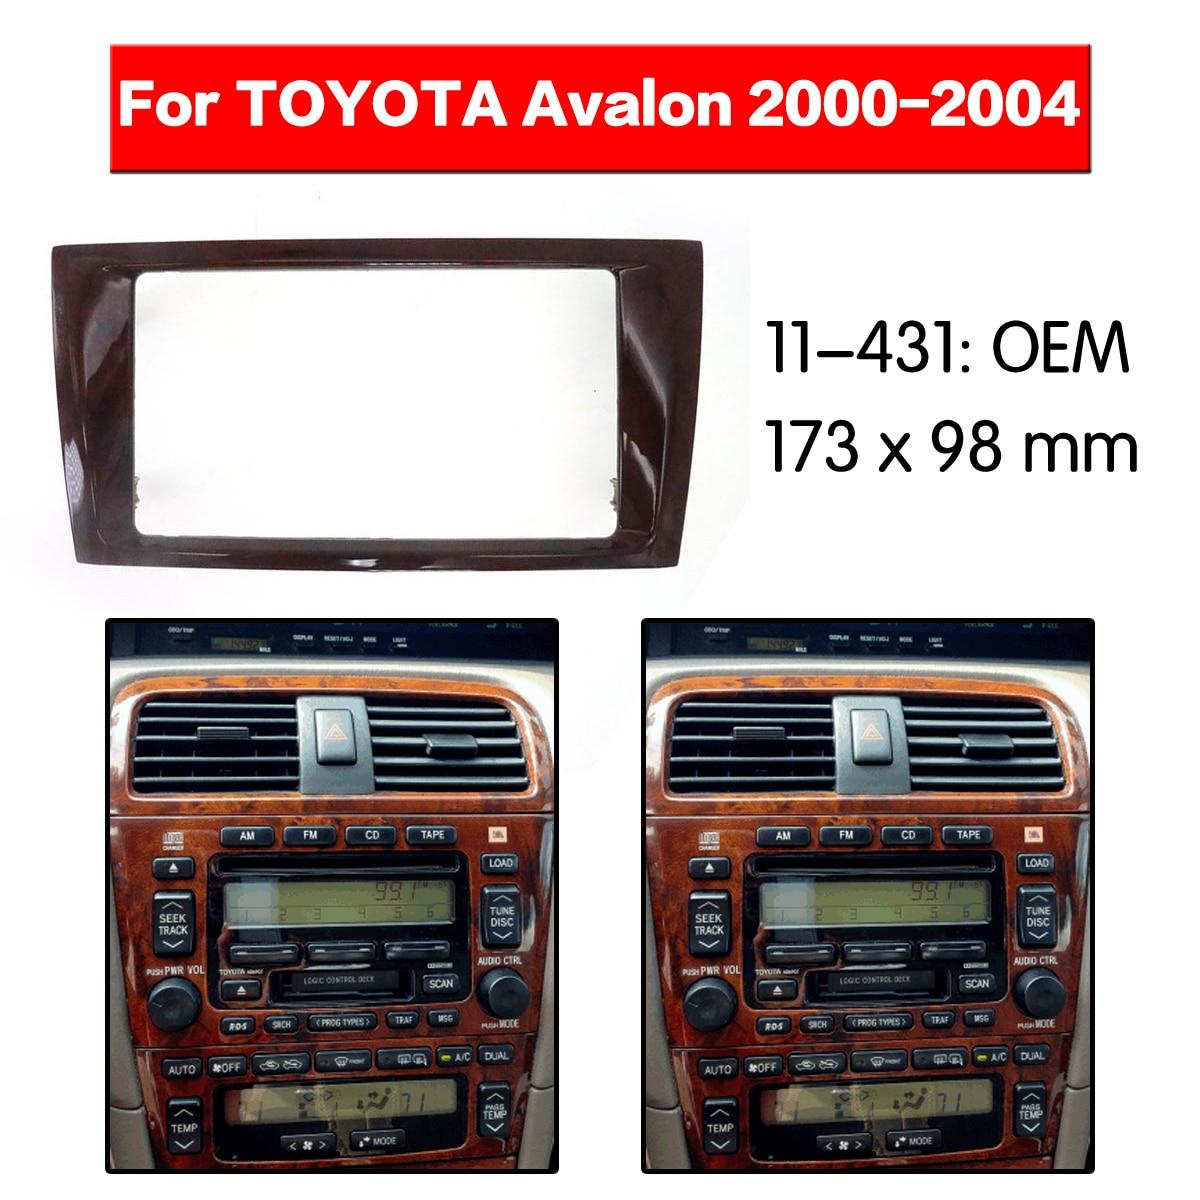 Kreativ 2 Din Auto Radio Stereo Montage Installation Adapter Fascia Für Toyota Avalon 2000 2001 2002 2003 2004 Rahmen Audio GläNzend